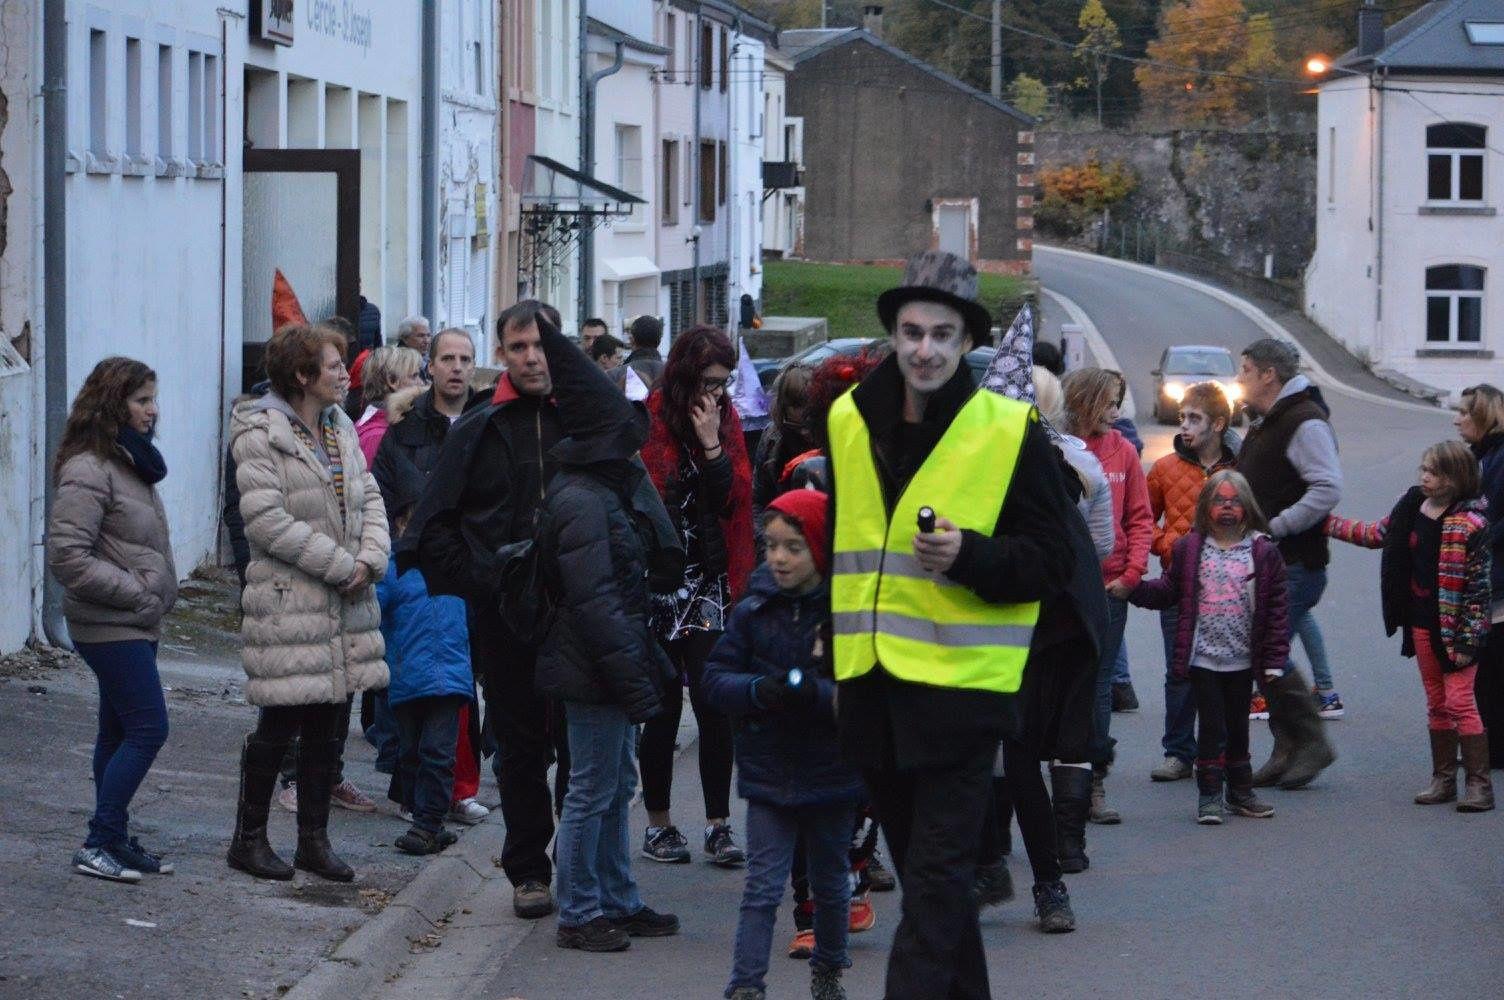 Marche halloween